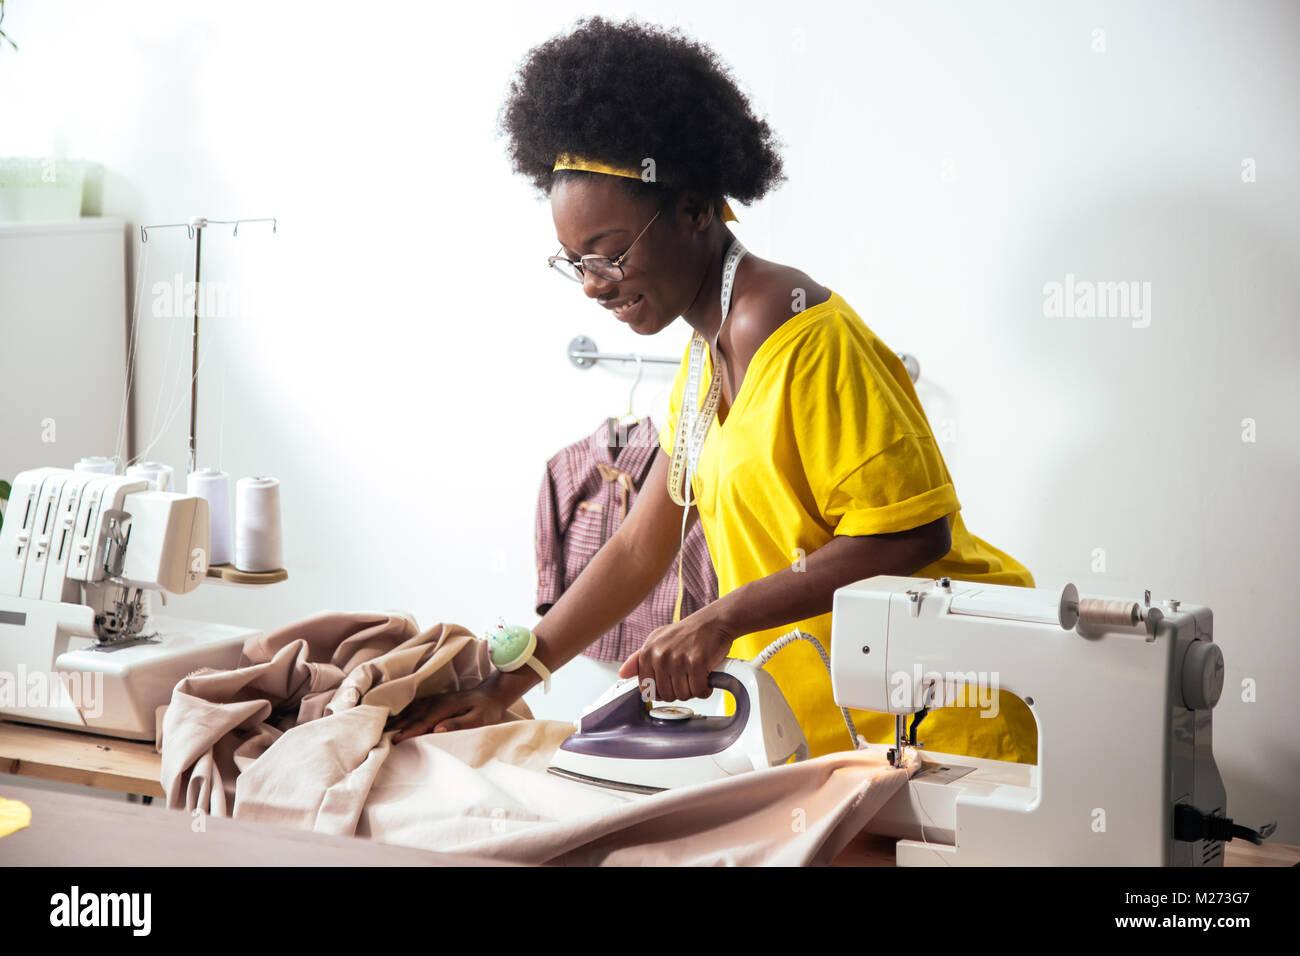 Femme africaine couturière chiffon repassage Photo Stock